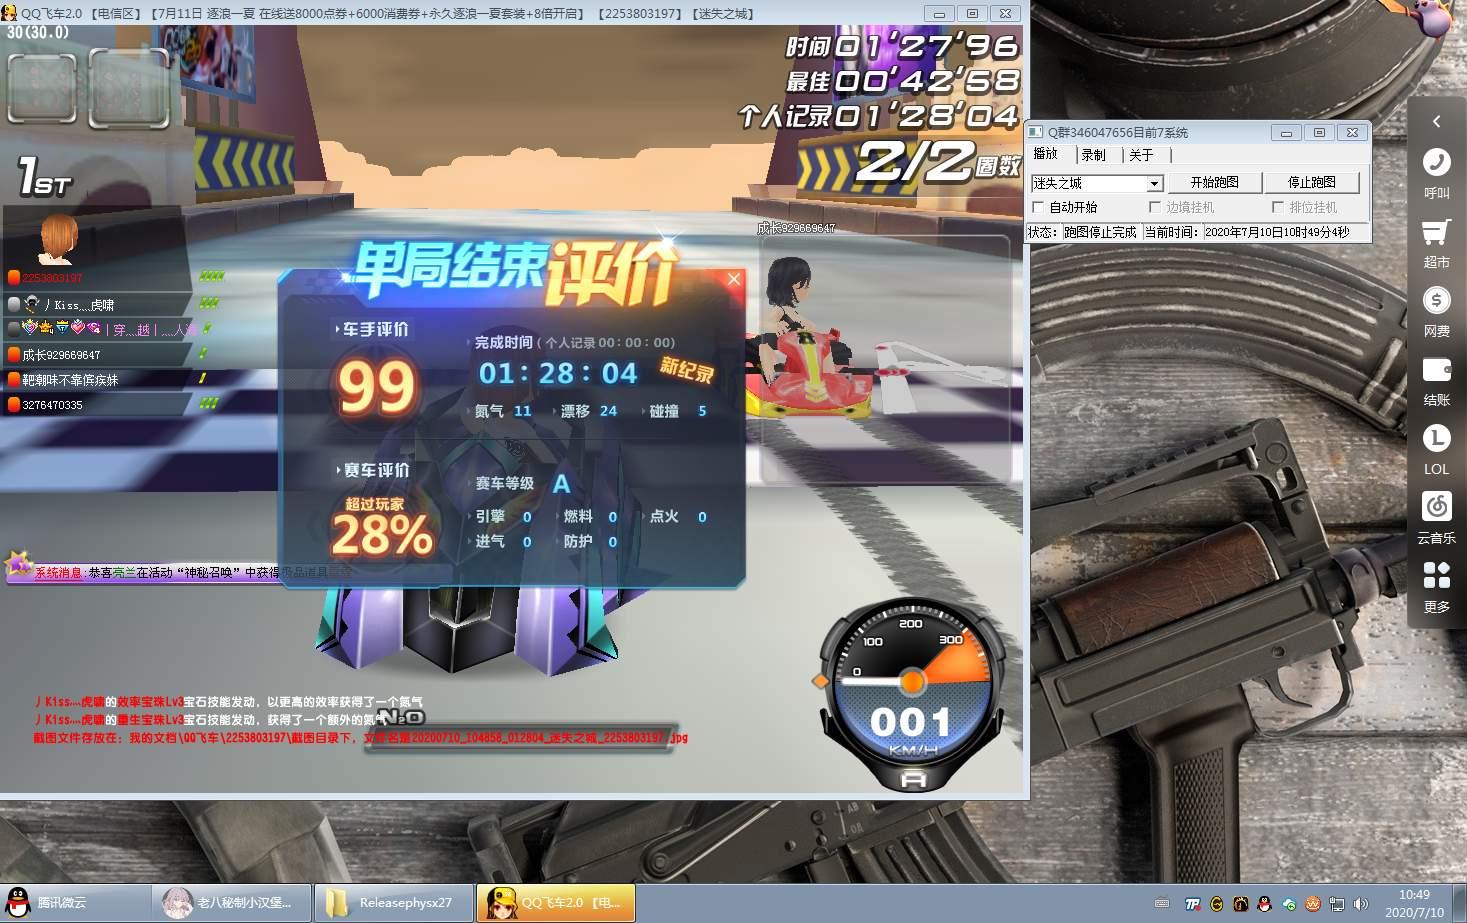 QQ飞车瞬移助手 v7.10自动跑图辅助/免费版